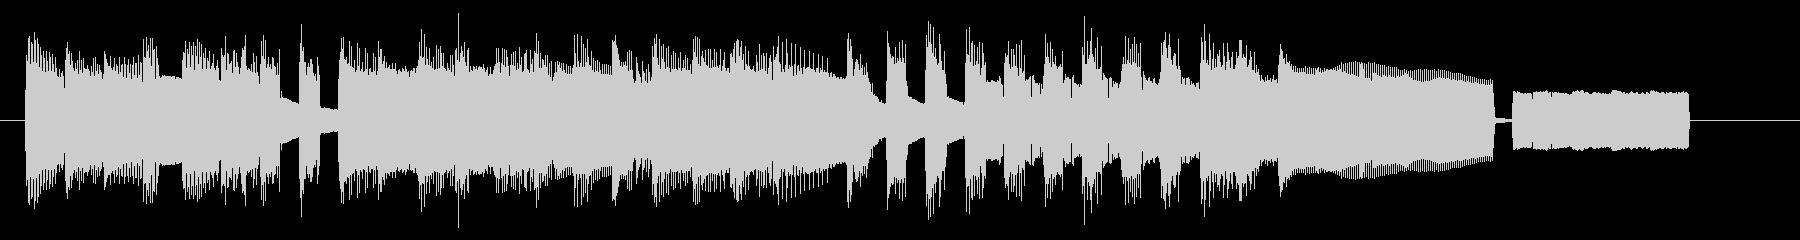 NES STG C07-1(クリア1)の未再生の波形